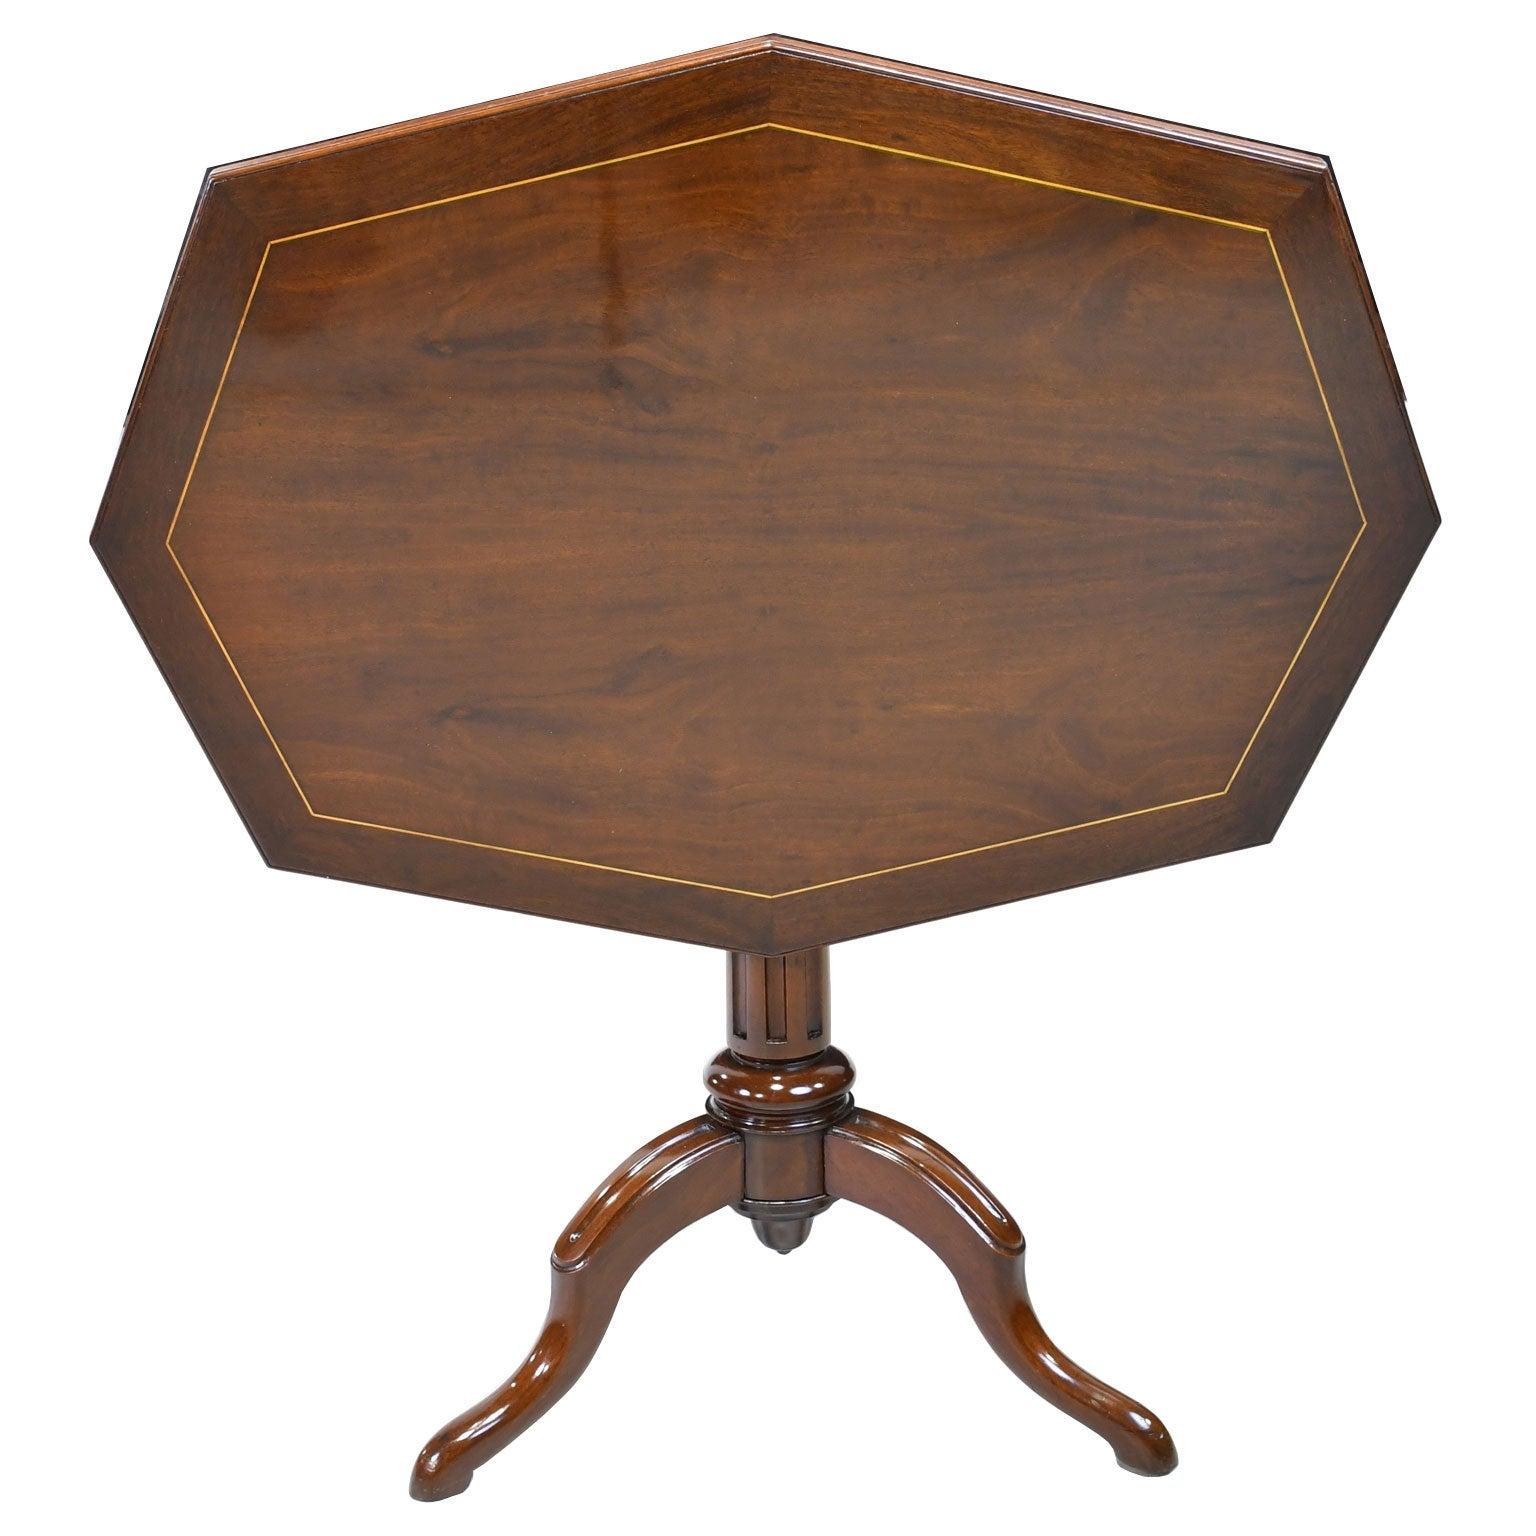 19th Century English Elongated Octagonal Tripod Tilt Top Table in Mahogany